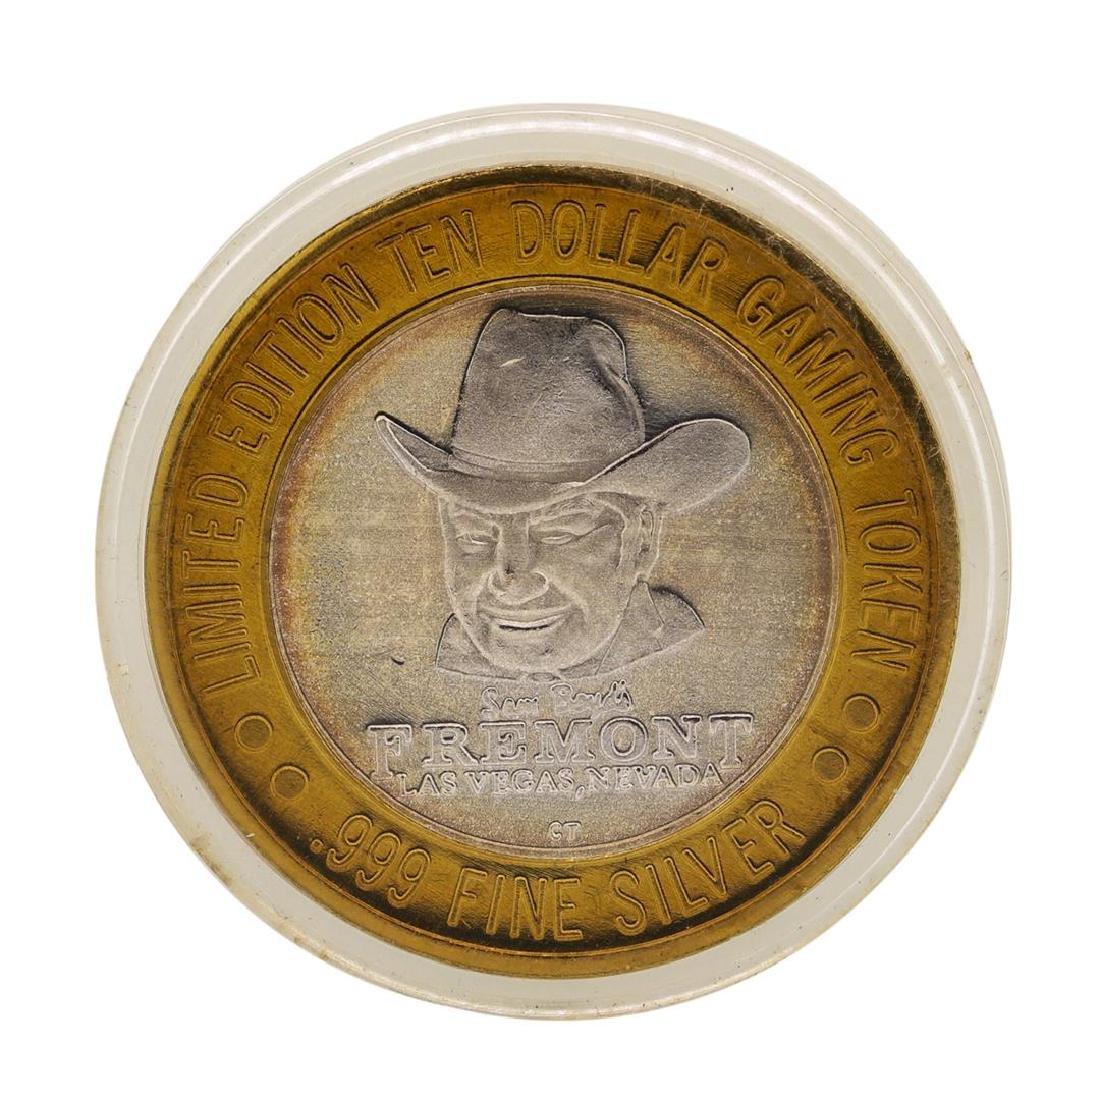 .999 Fine Silver Sam Boyd's Fremont $10 Casino Limited